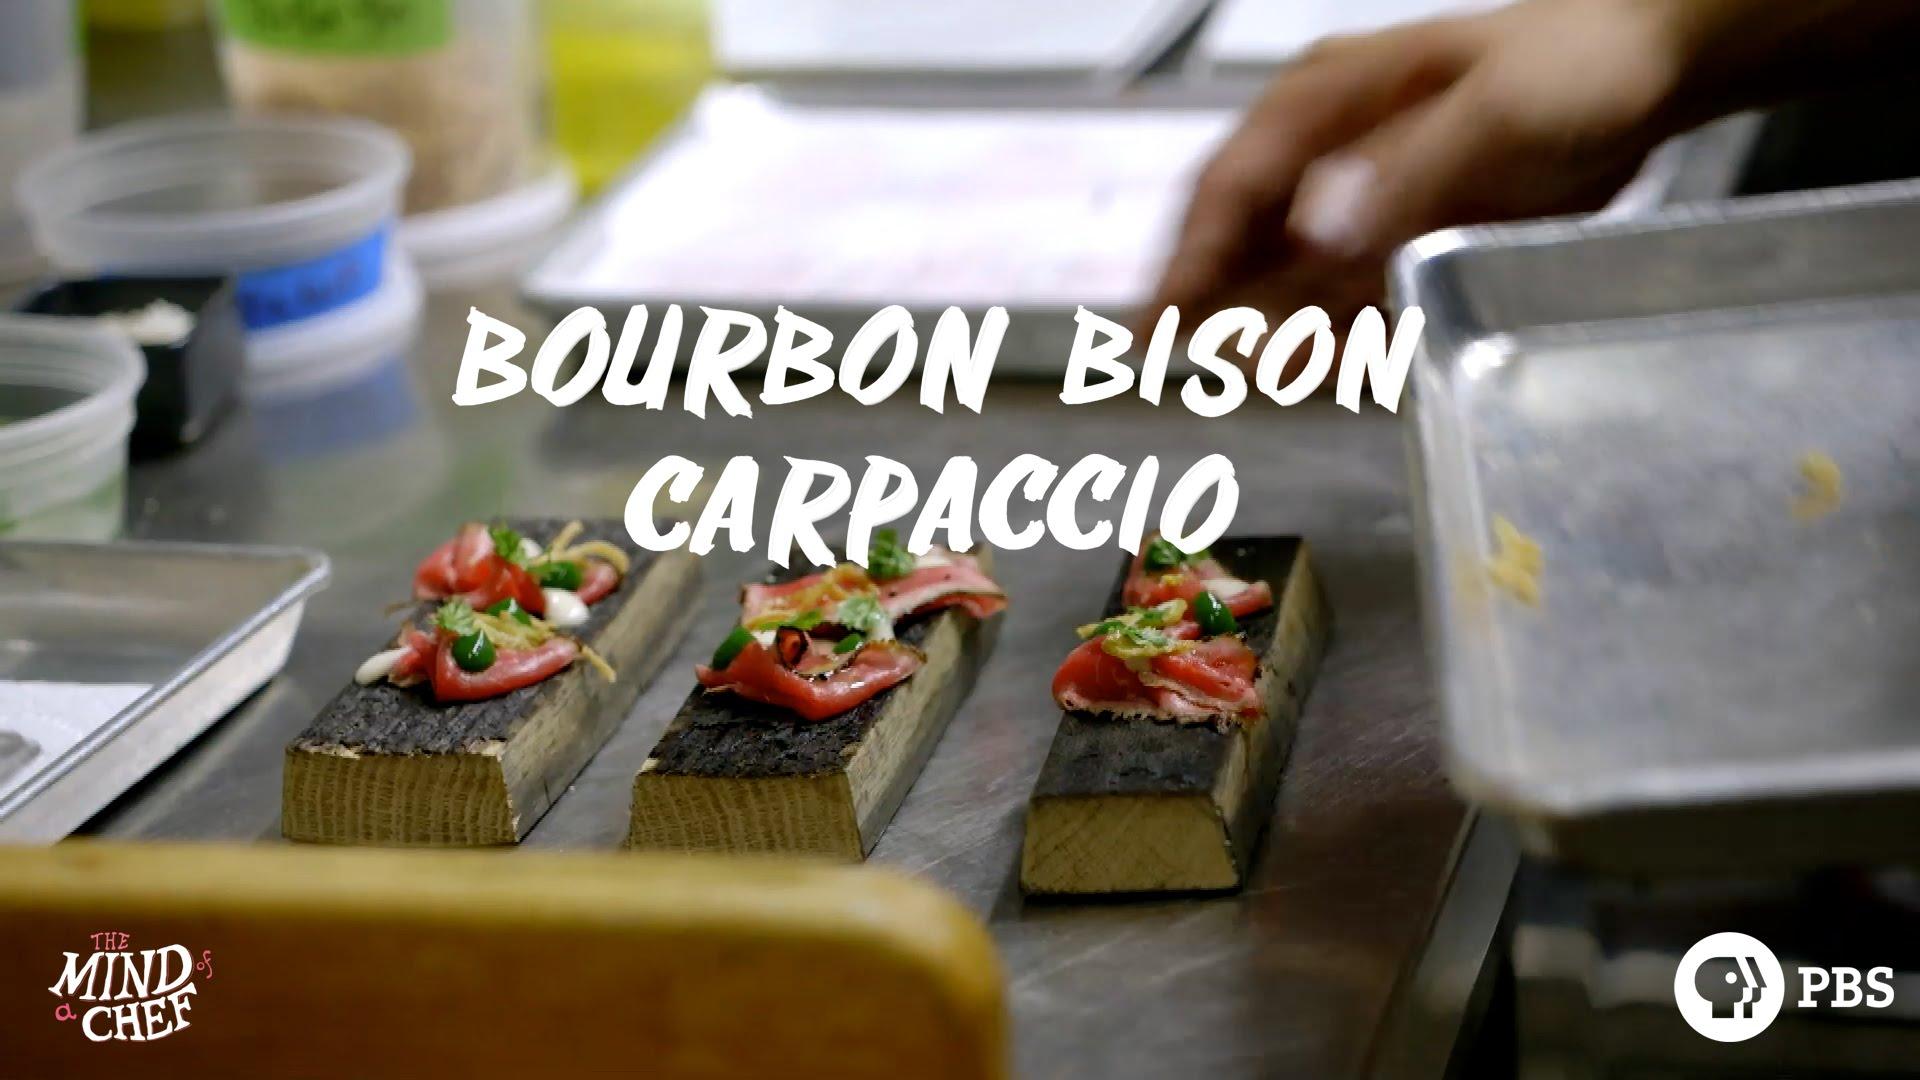 Chef Edward Lee Makes Bourbon Bison Carpaccio photo